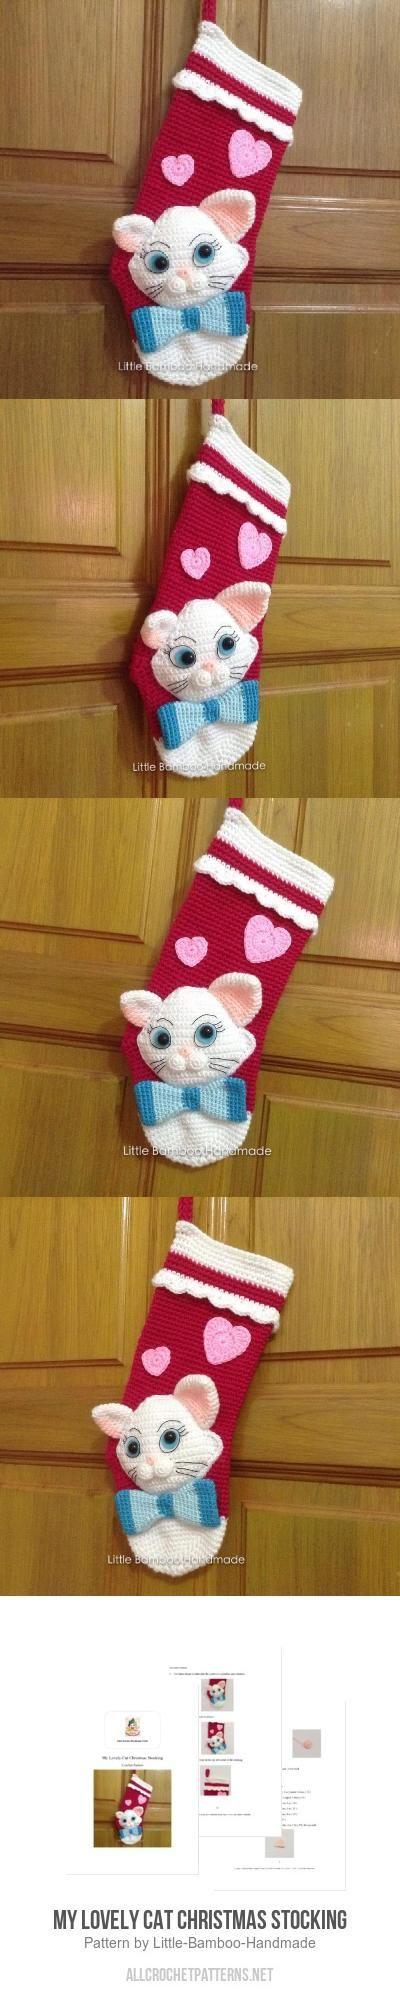 Christmas stocking decoration ideas - My Lovely Cat Christmas Stocking Crochet Pattern